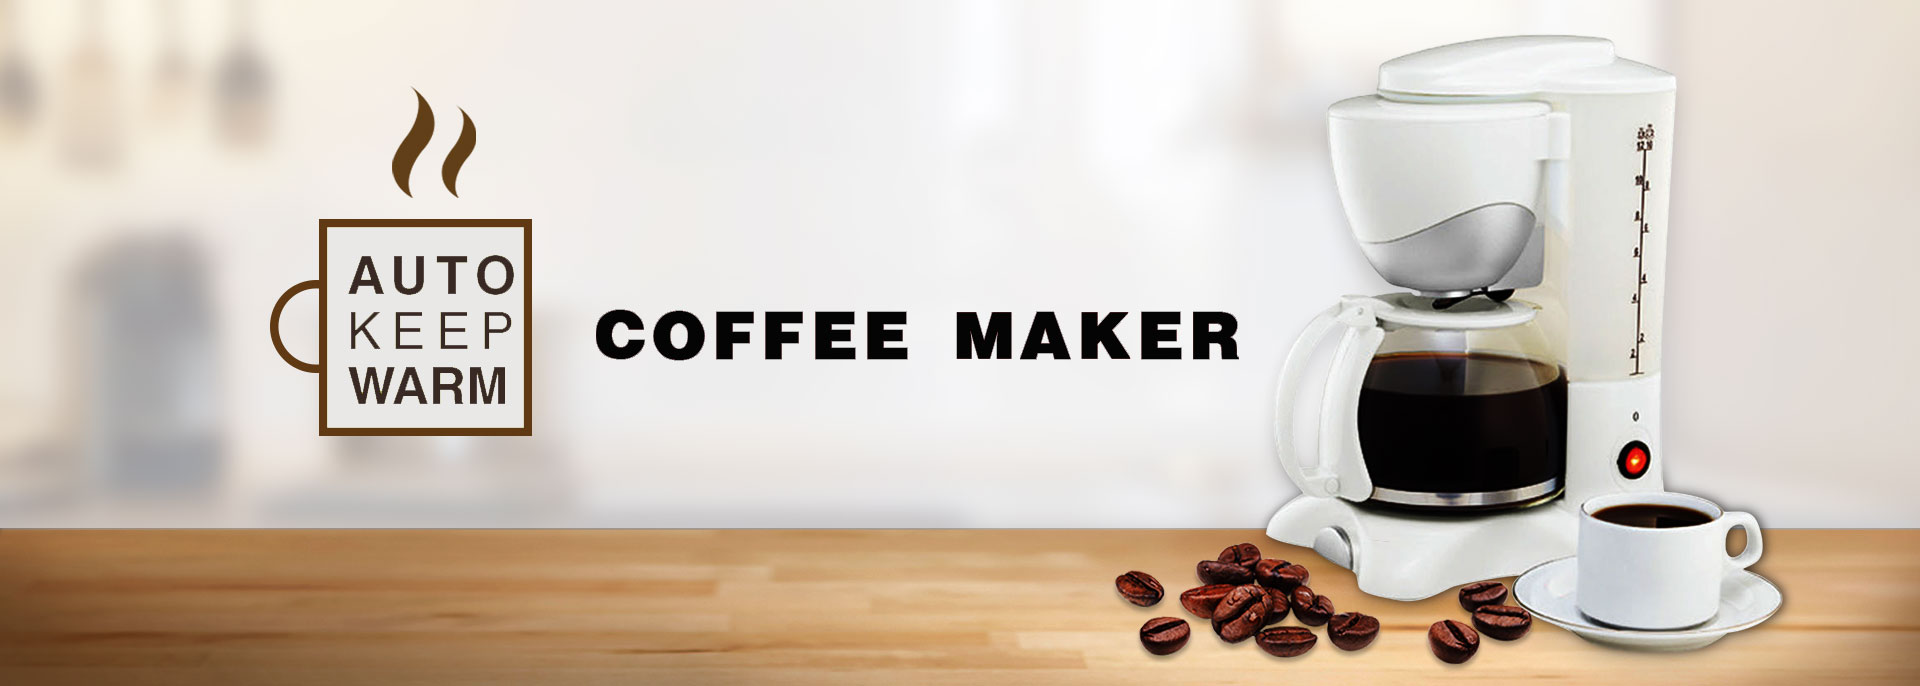 coffee-maker-ilustrasi-kont.jpg